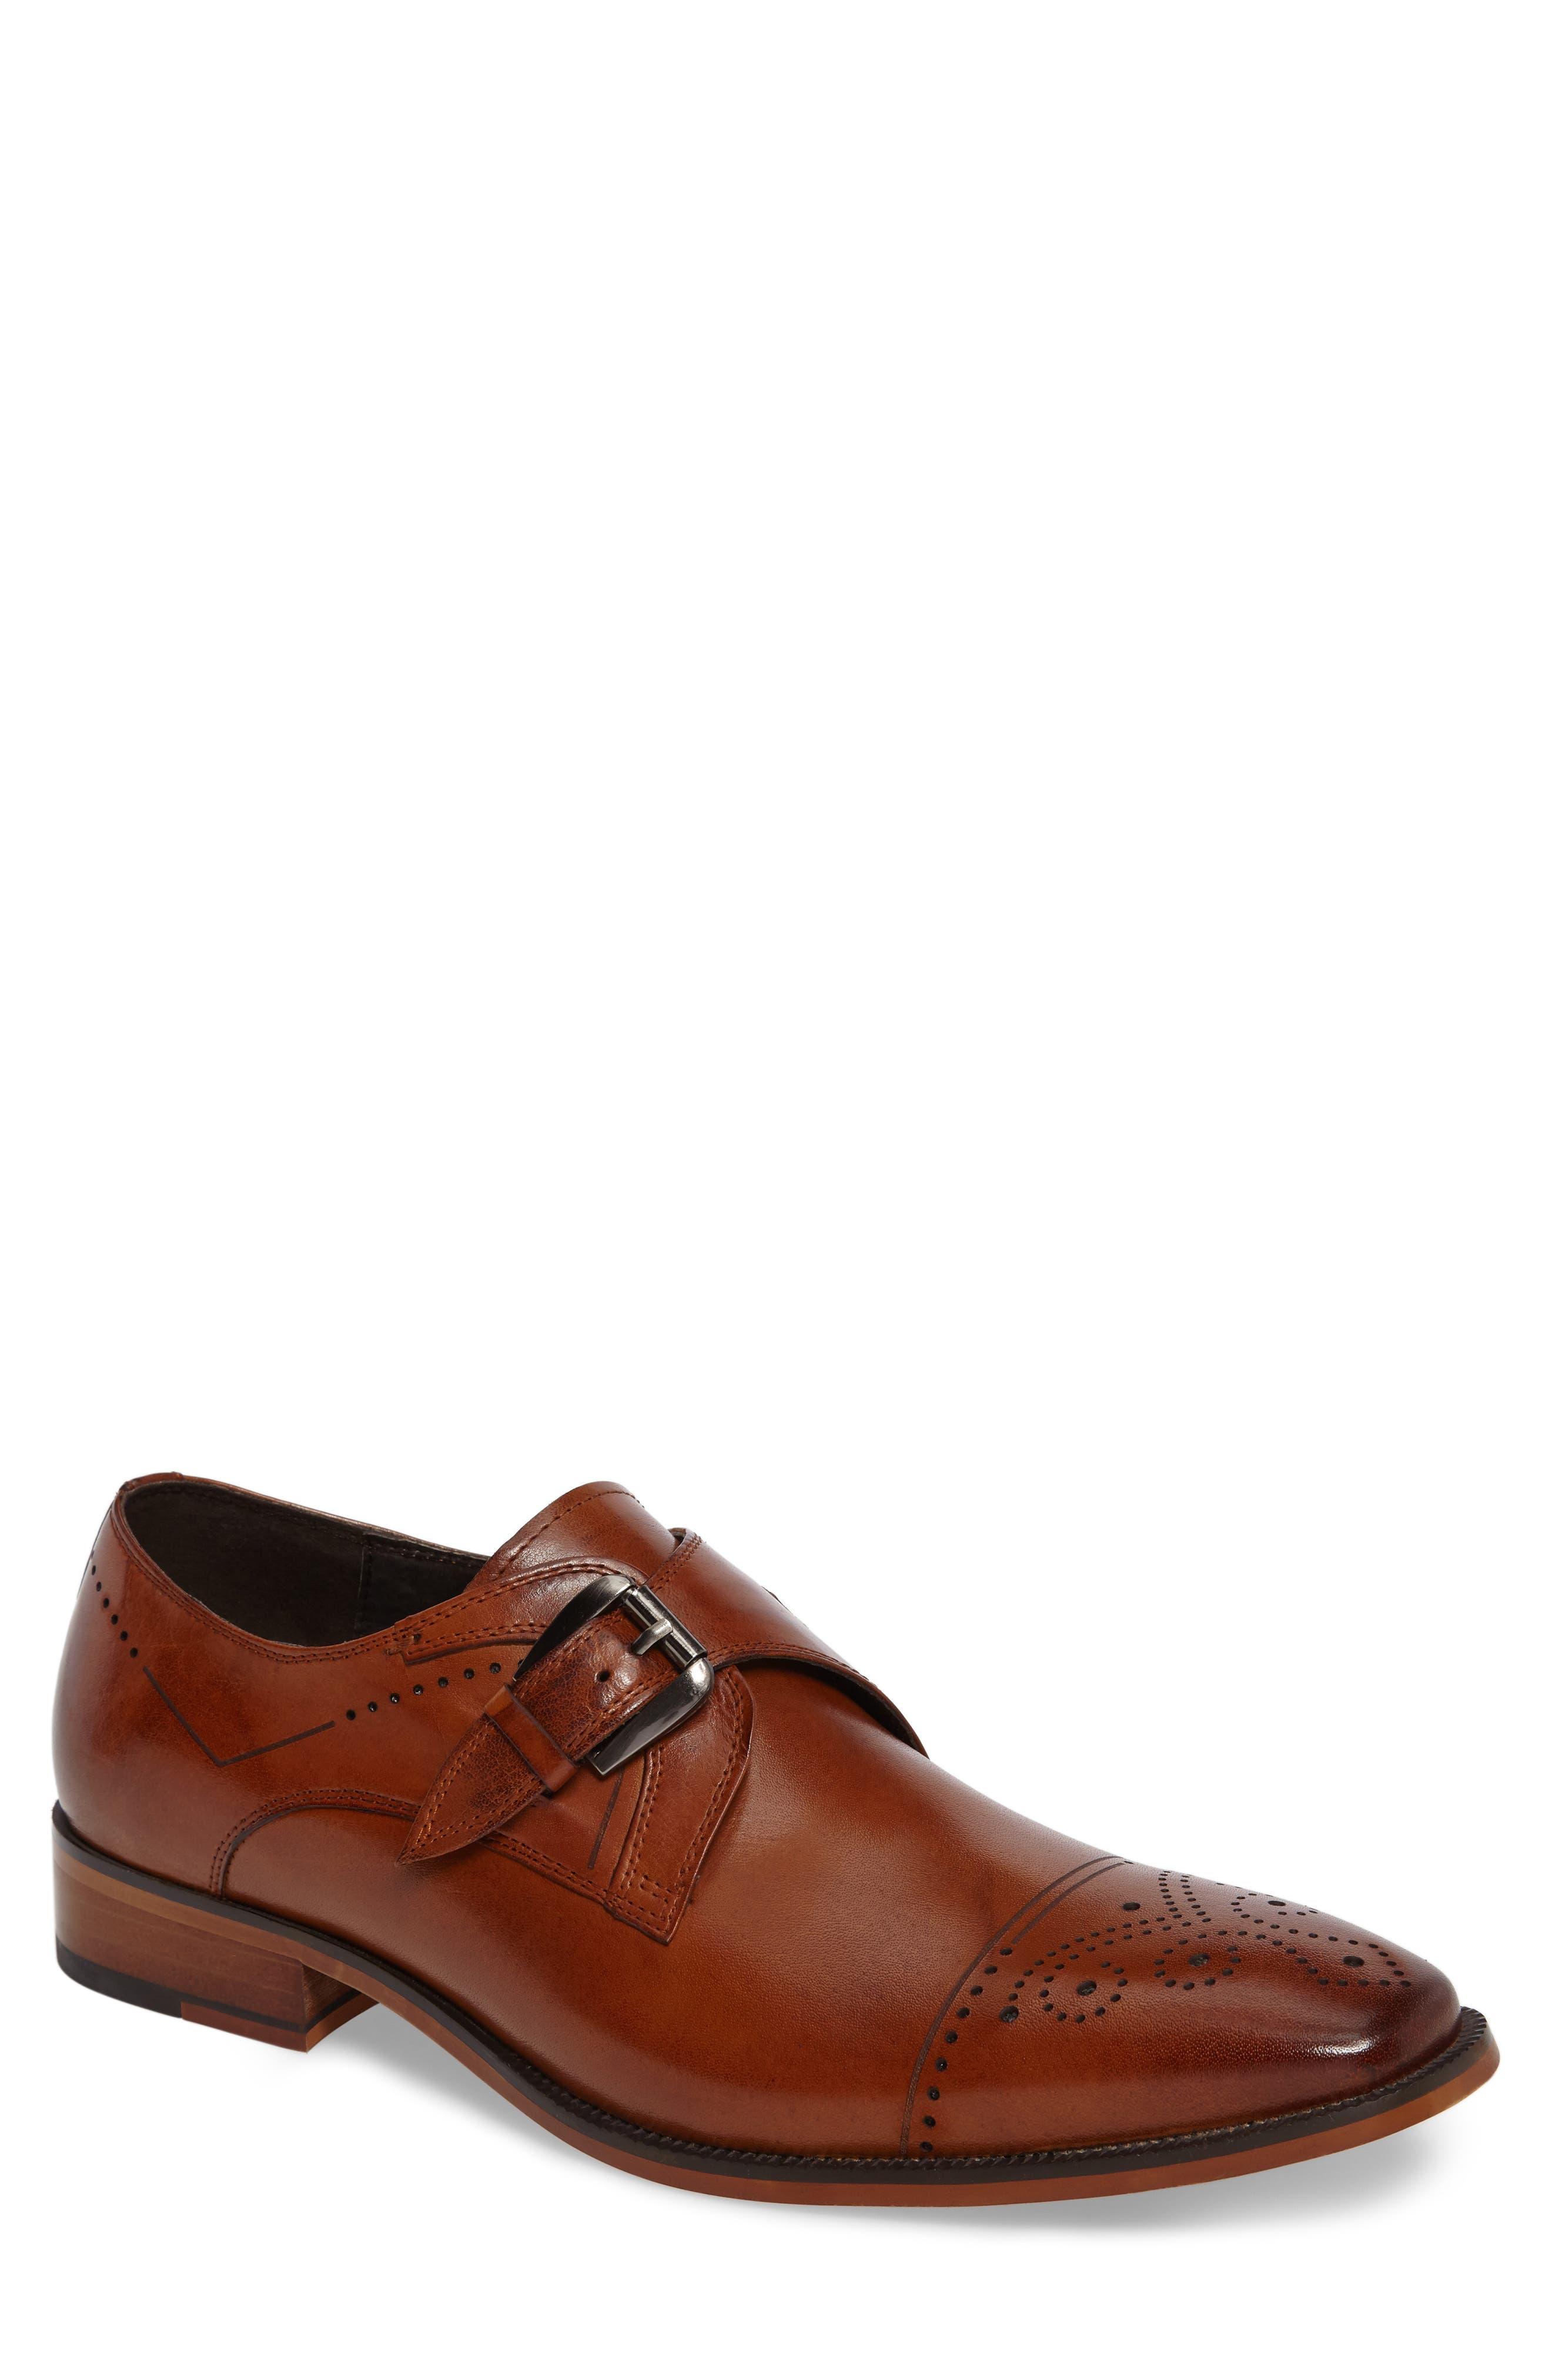 Main Image - Stacy Adams Kimball Monk Strap Shoe (Men)